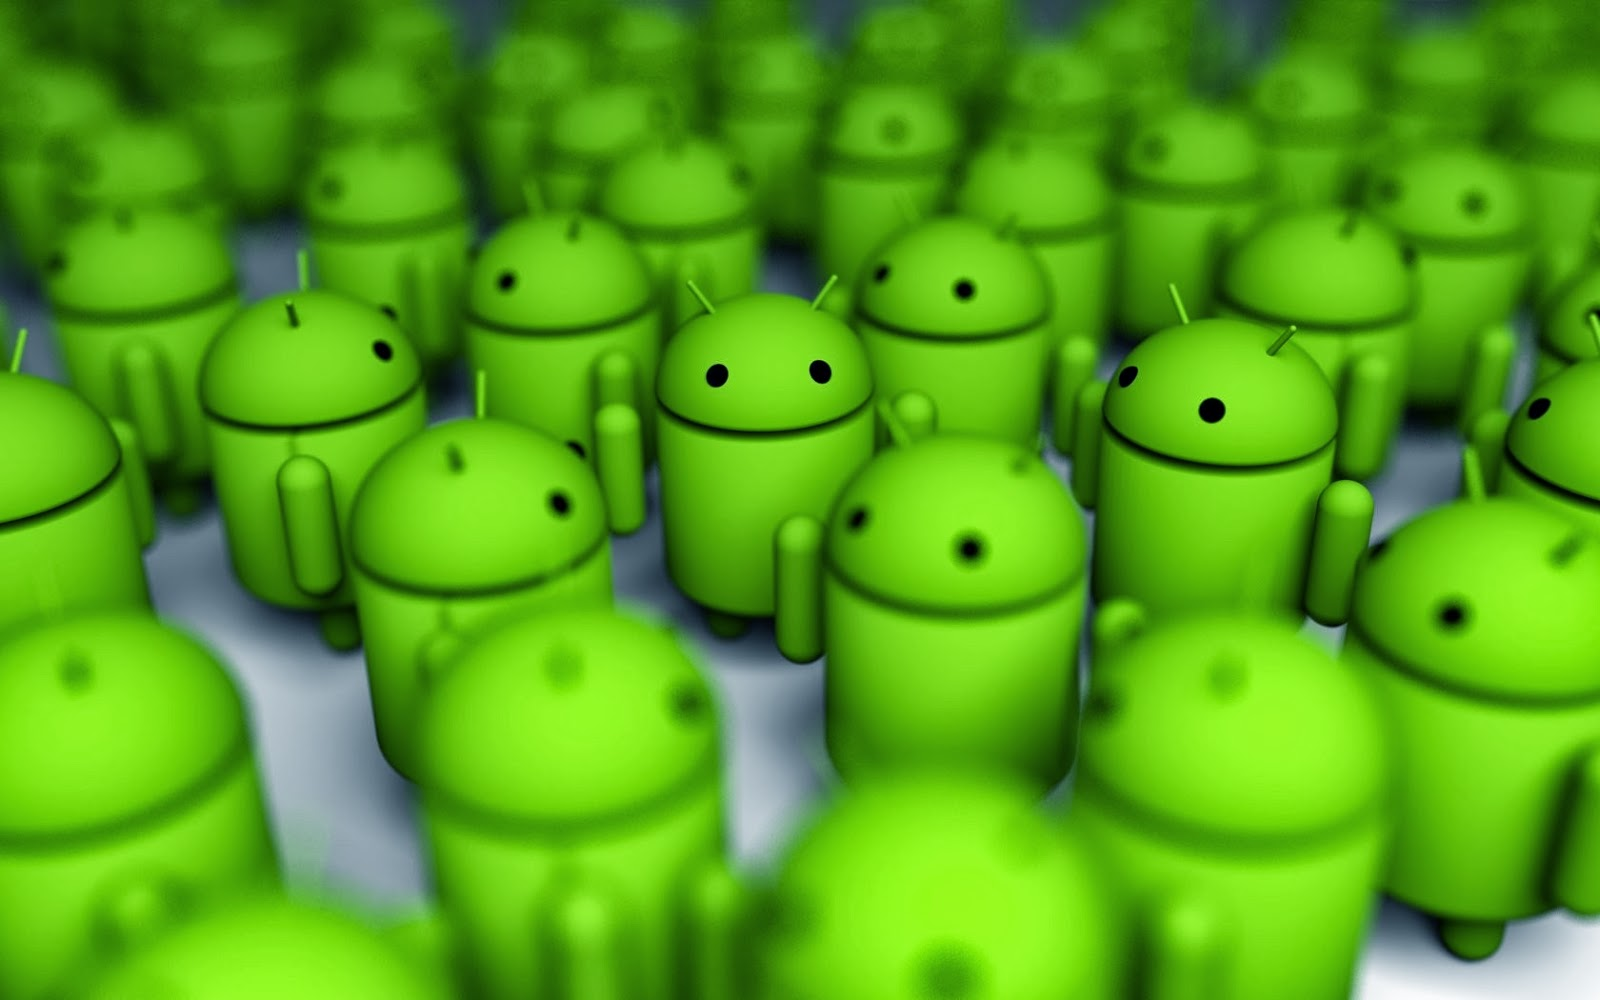 Android 3d fondo 3d de androides fondos de pantalla hd for Fondos de pantalla para android gratis